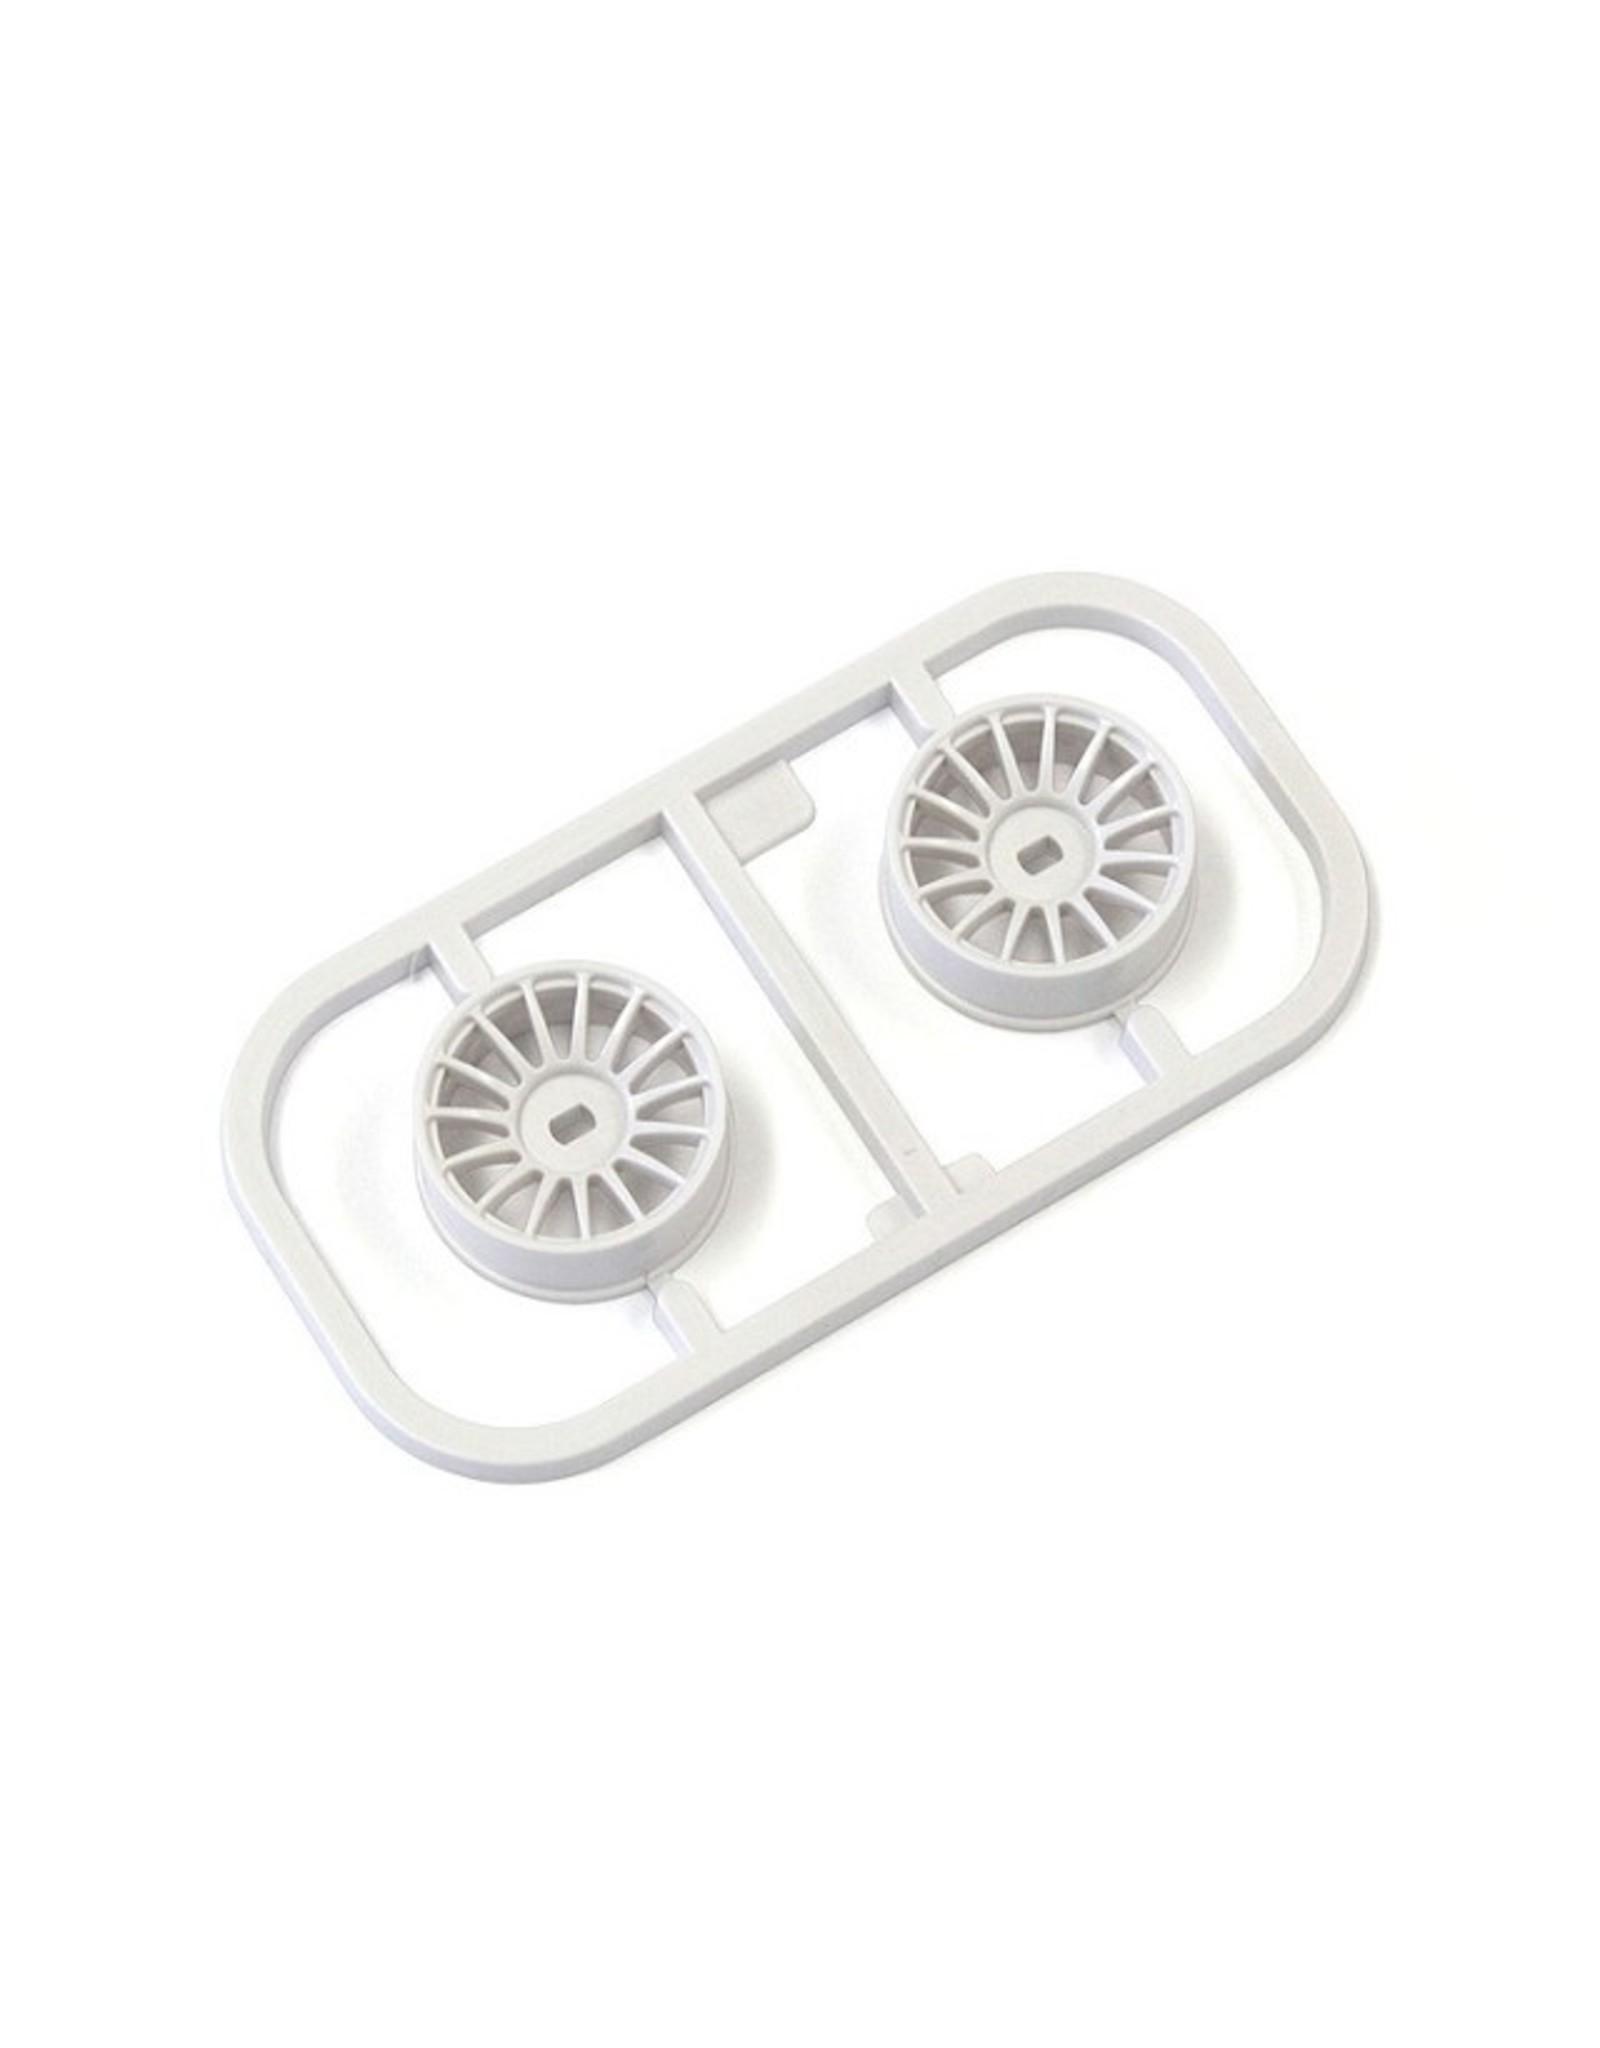 Kyosho Multi Wheel N/Offset 1.5 (White/AWD/2pcs.) (MDH100W-N15)